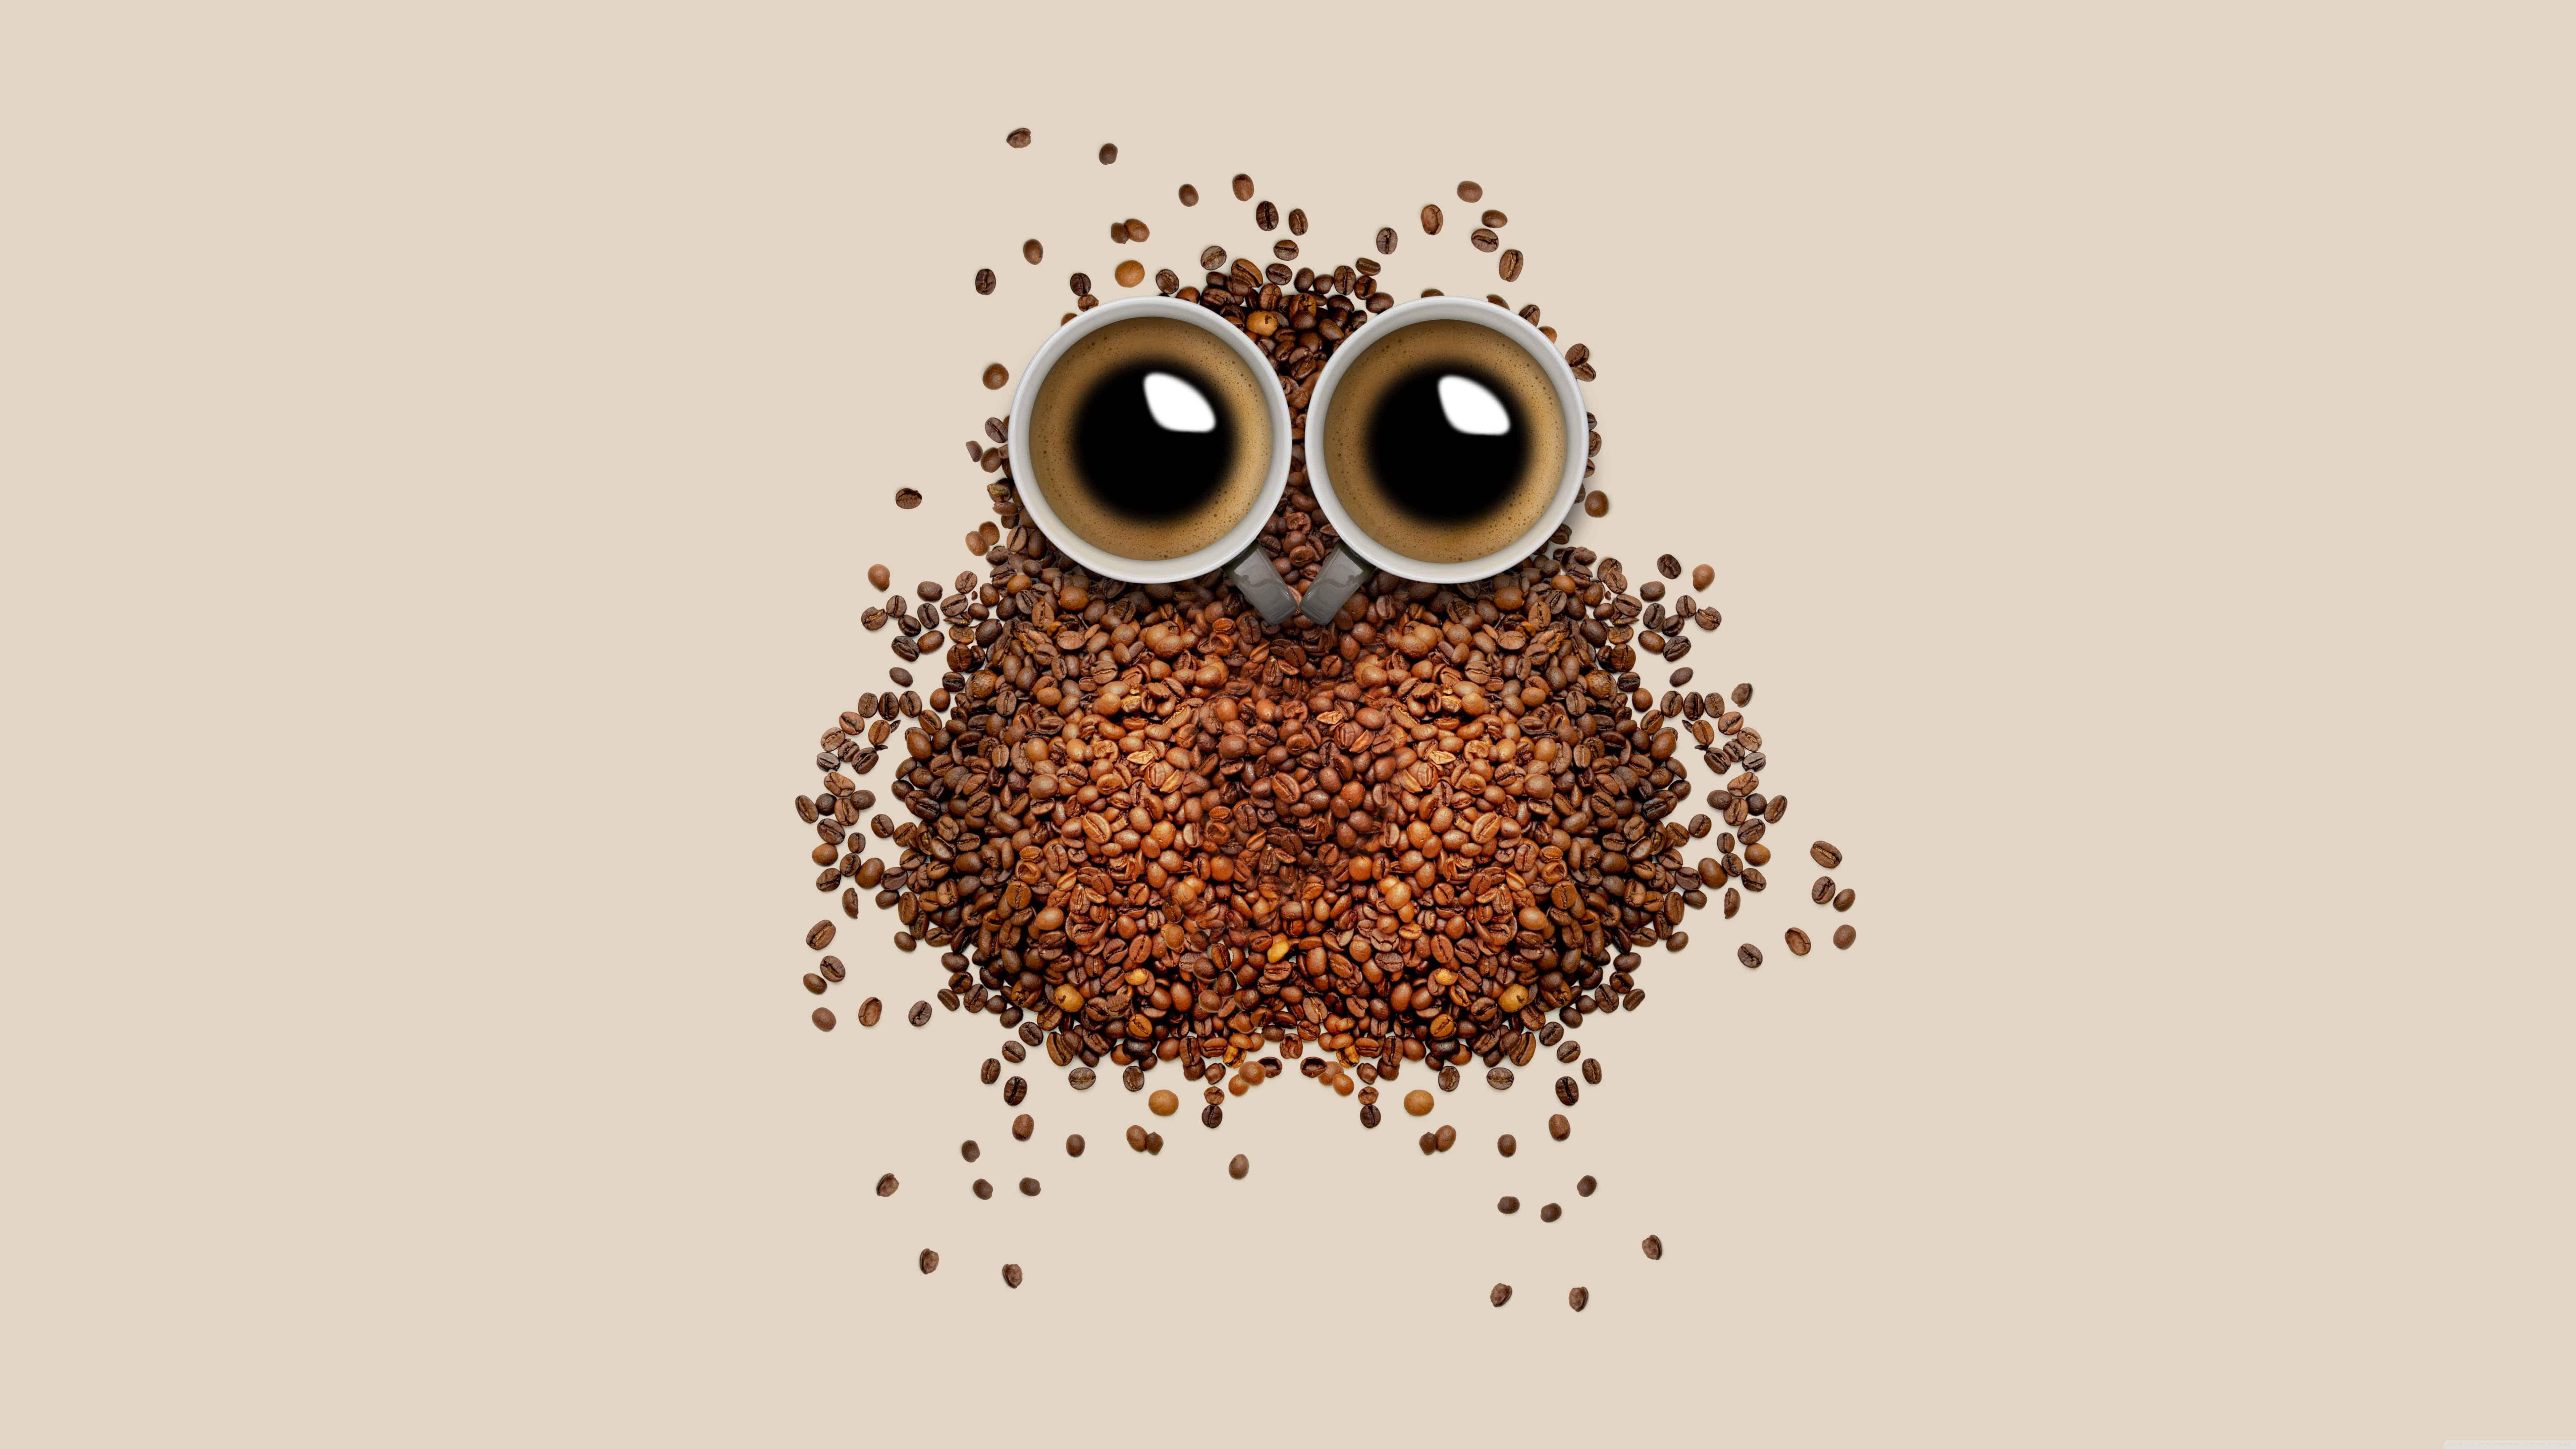 coffee bean owl uhd 8k wallpaper